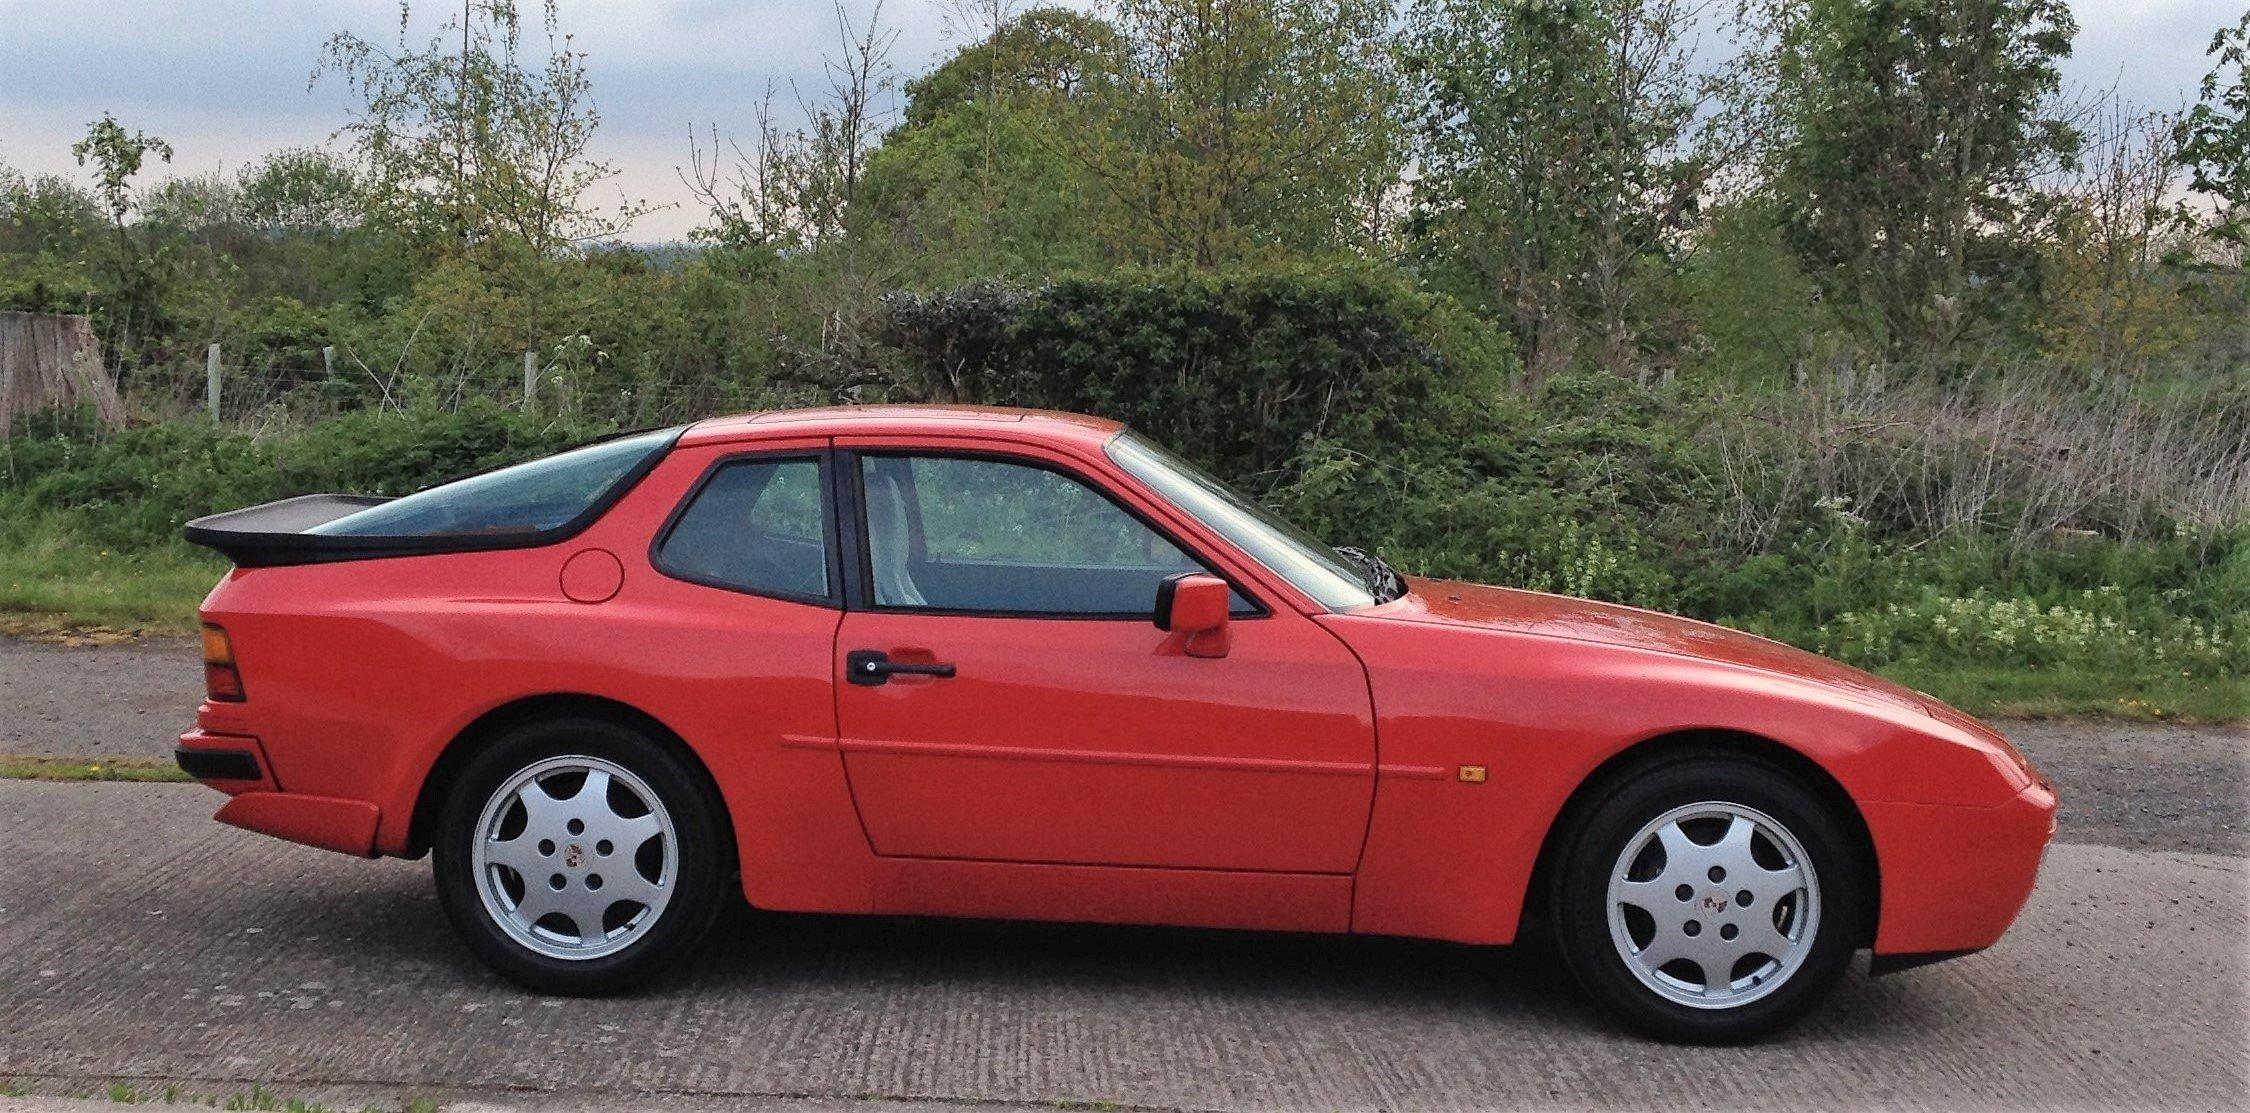 1991 Porsche 944 S2 For Sale (picture 3 of 6)